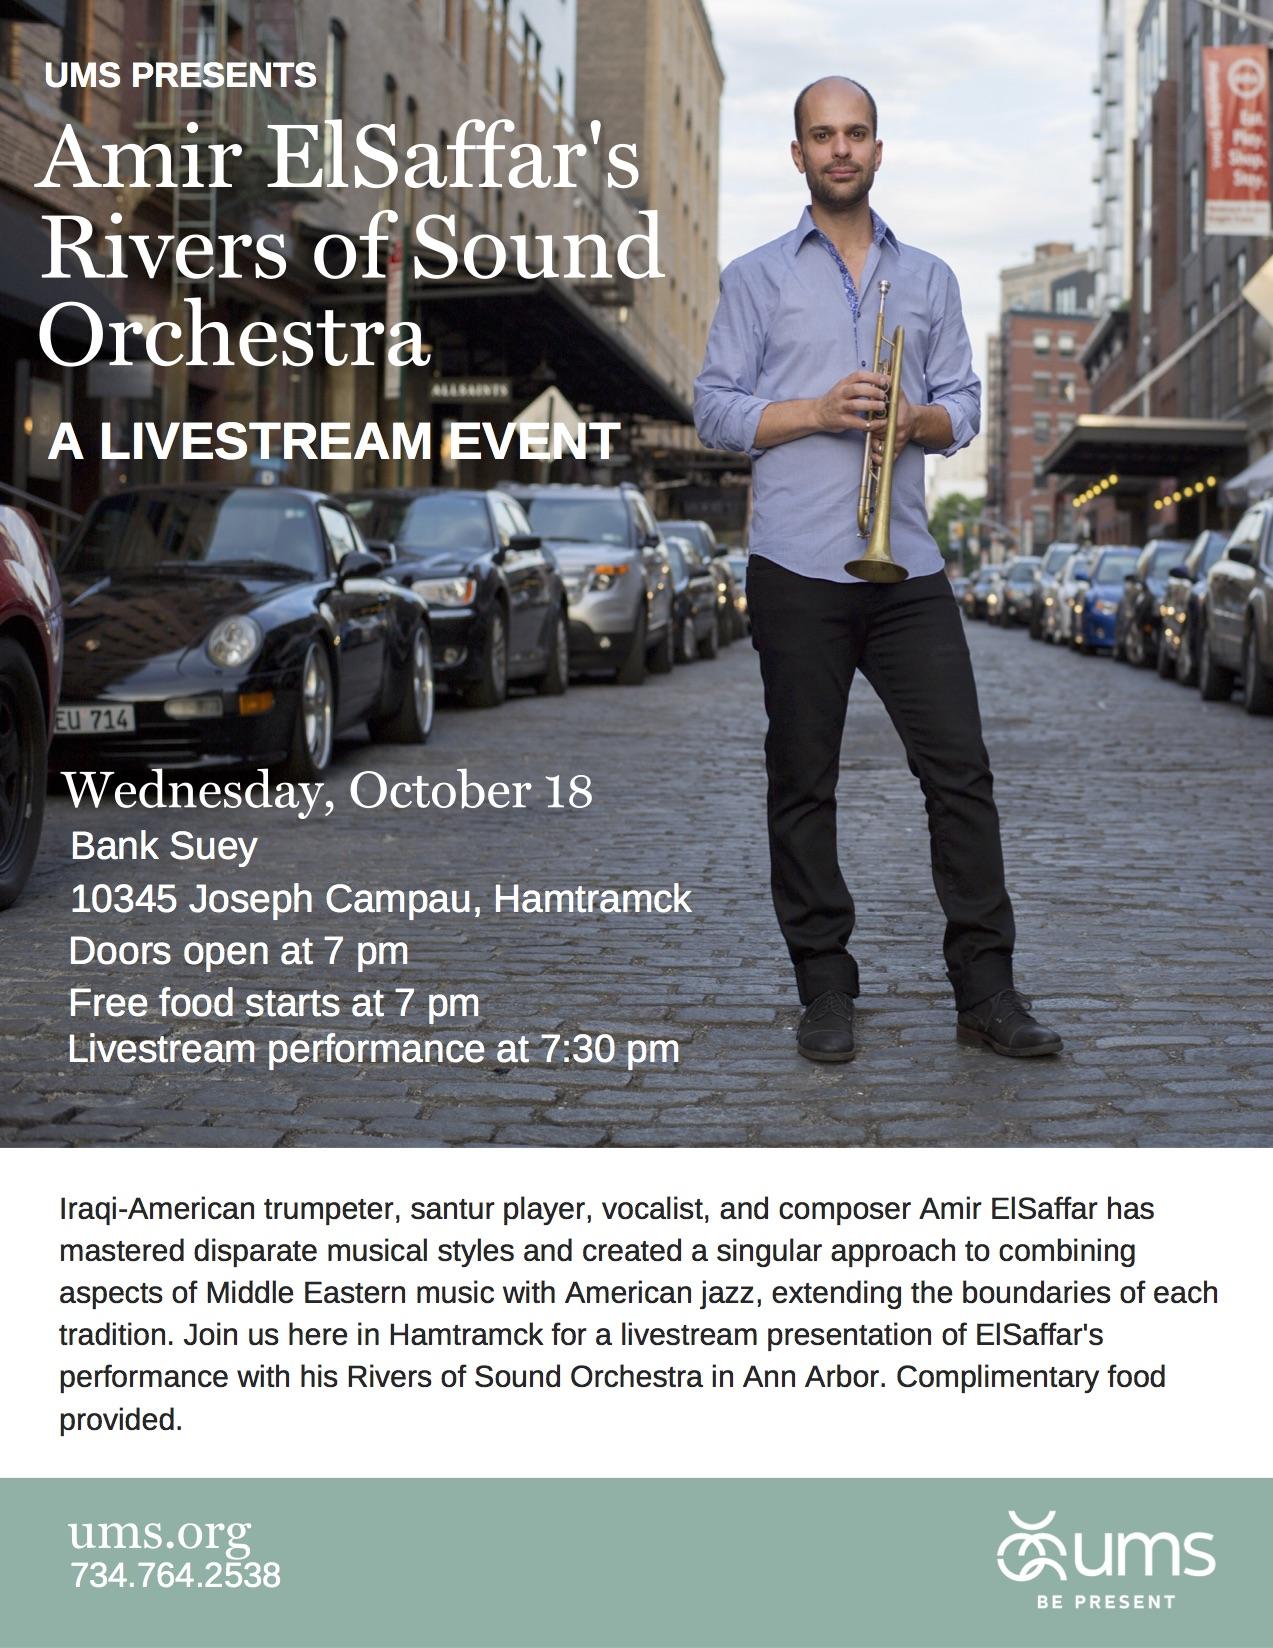 Amir ElSaffar Livestream Event Hamtramck.jpg